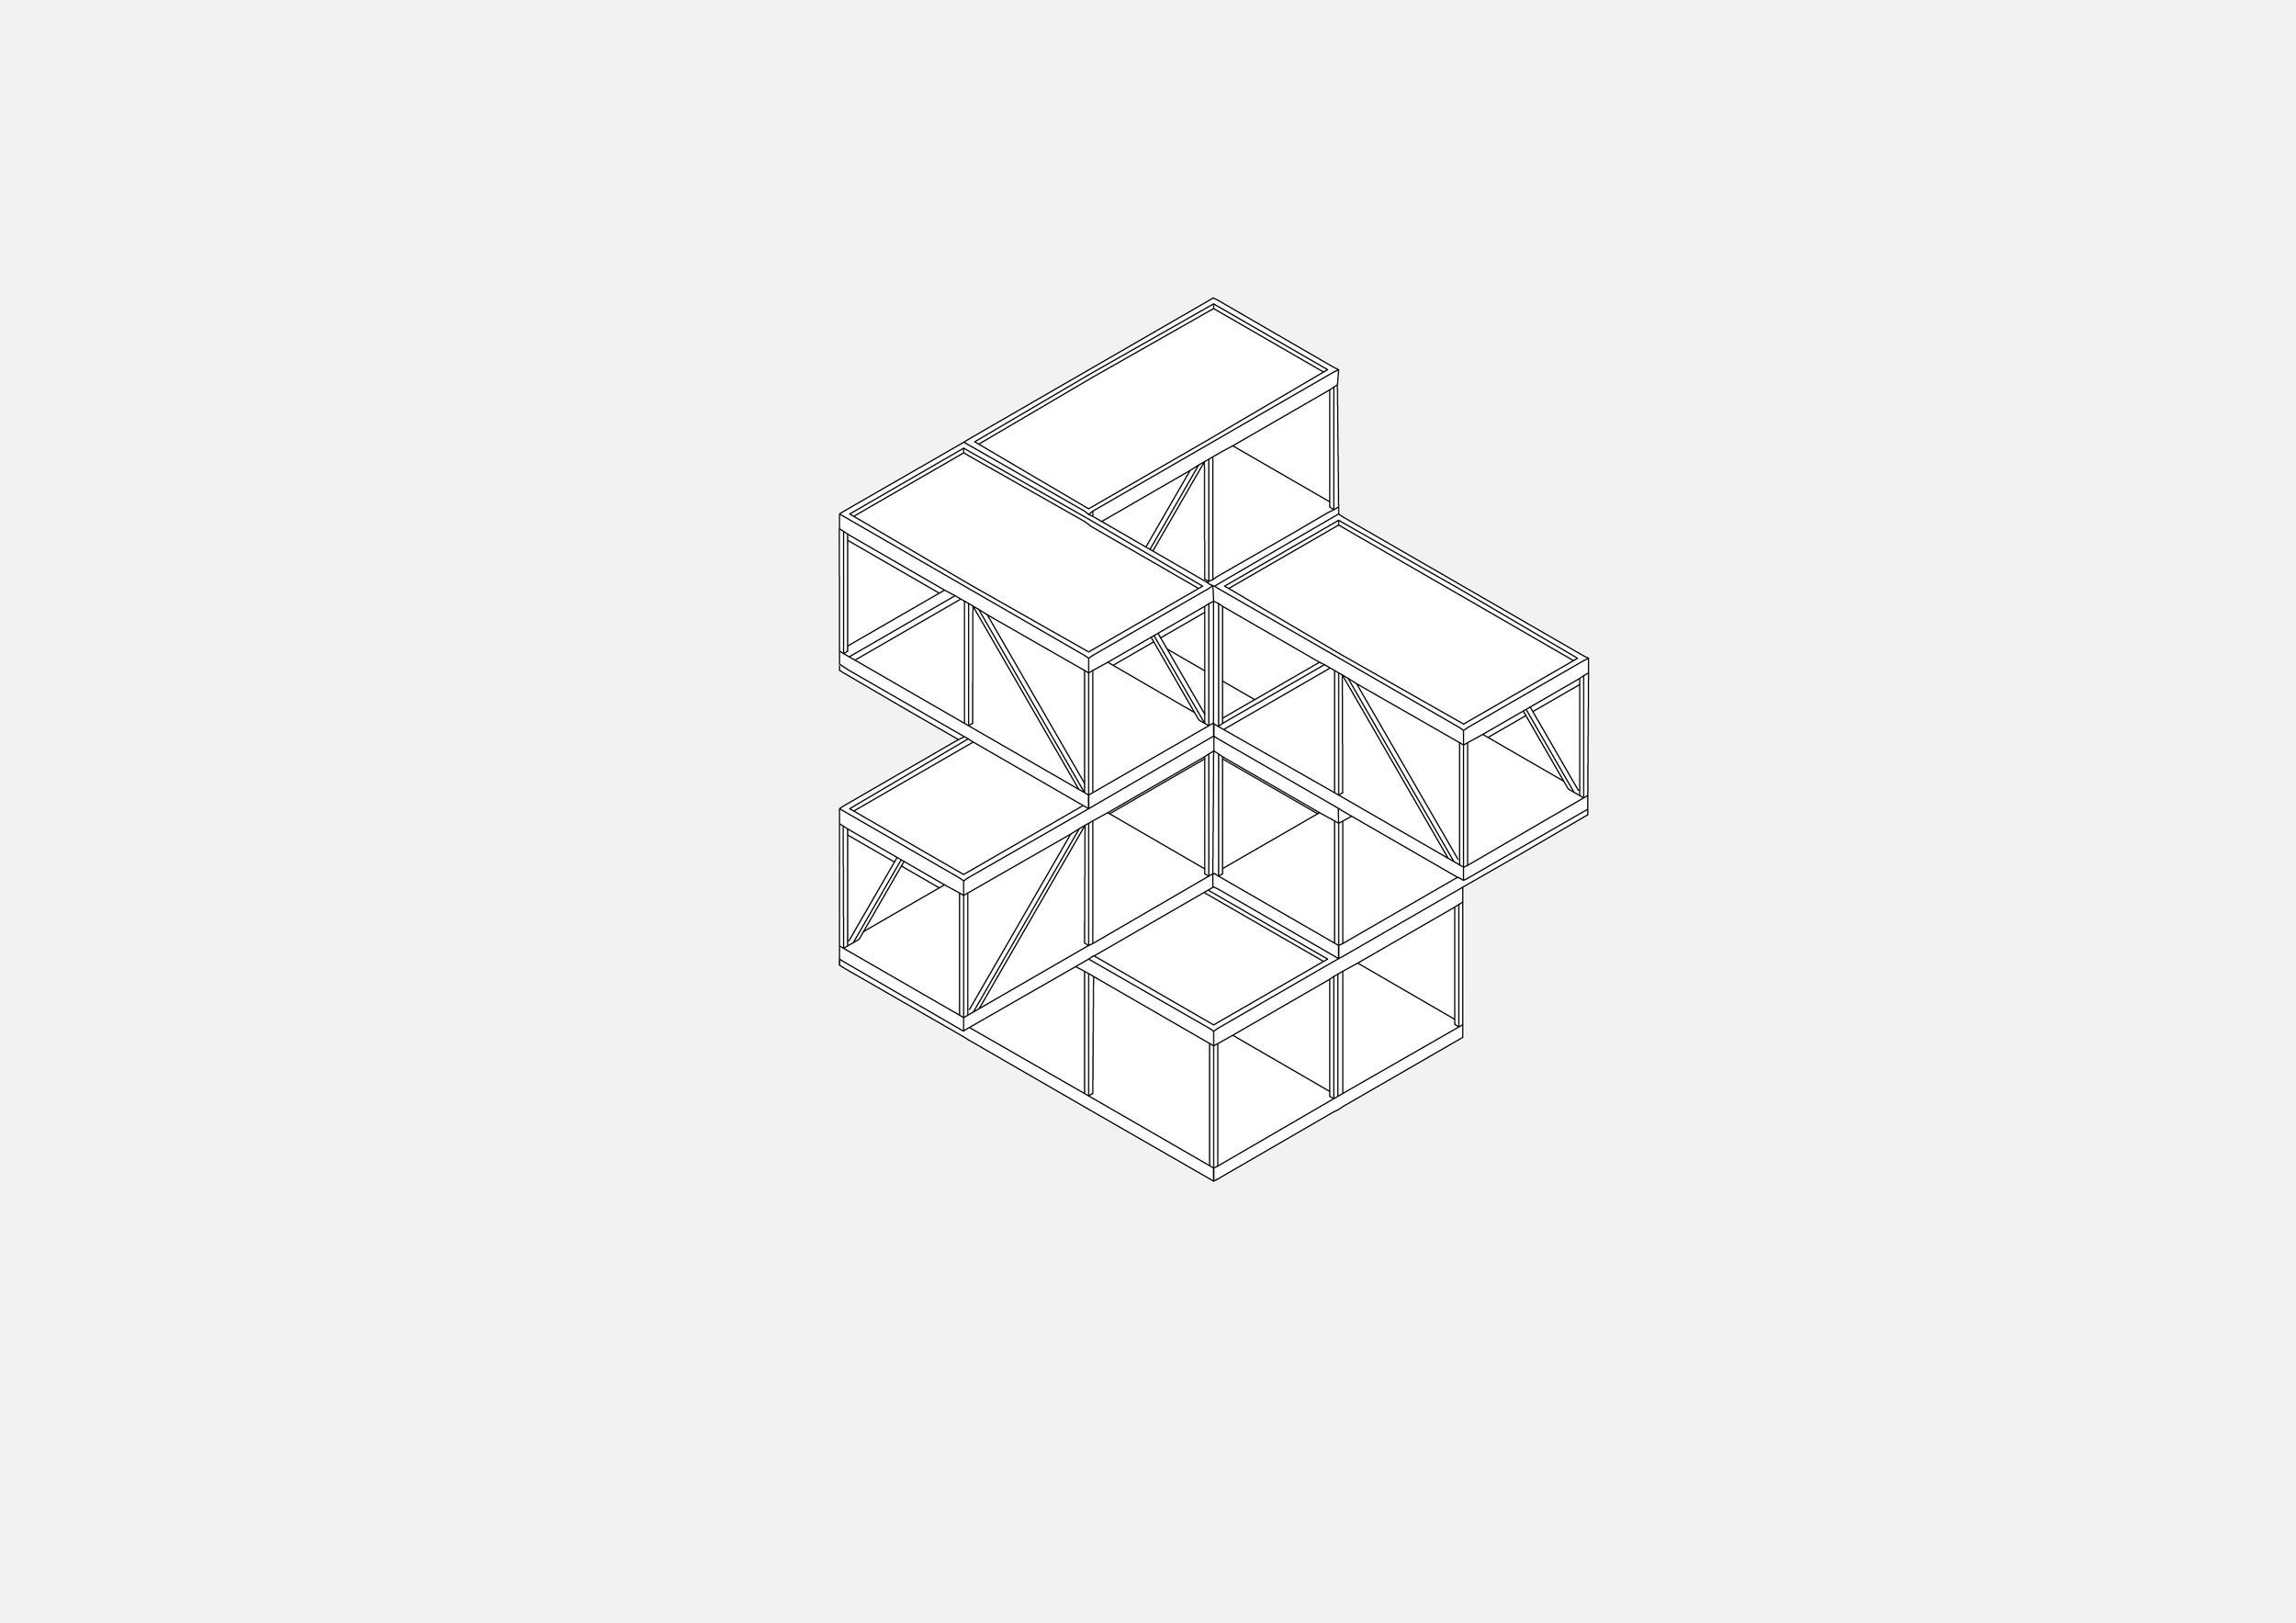 3x3 meters Modular Structure